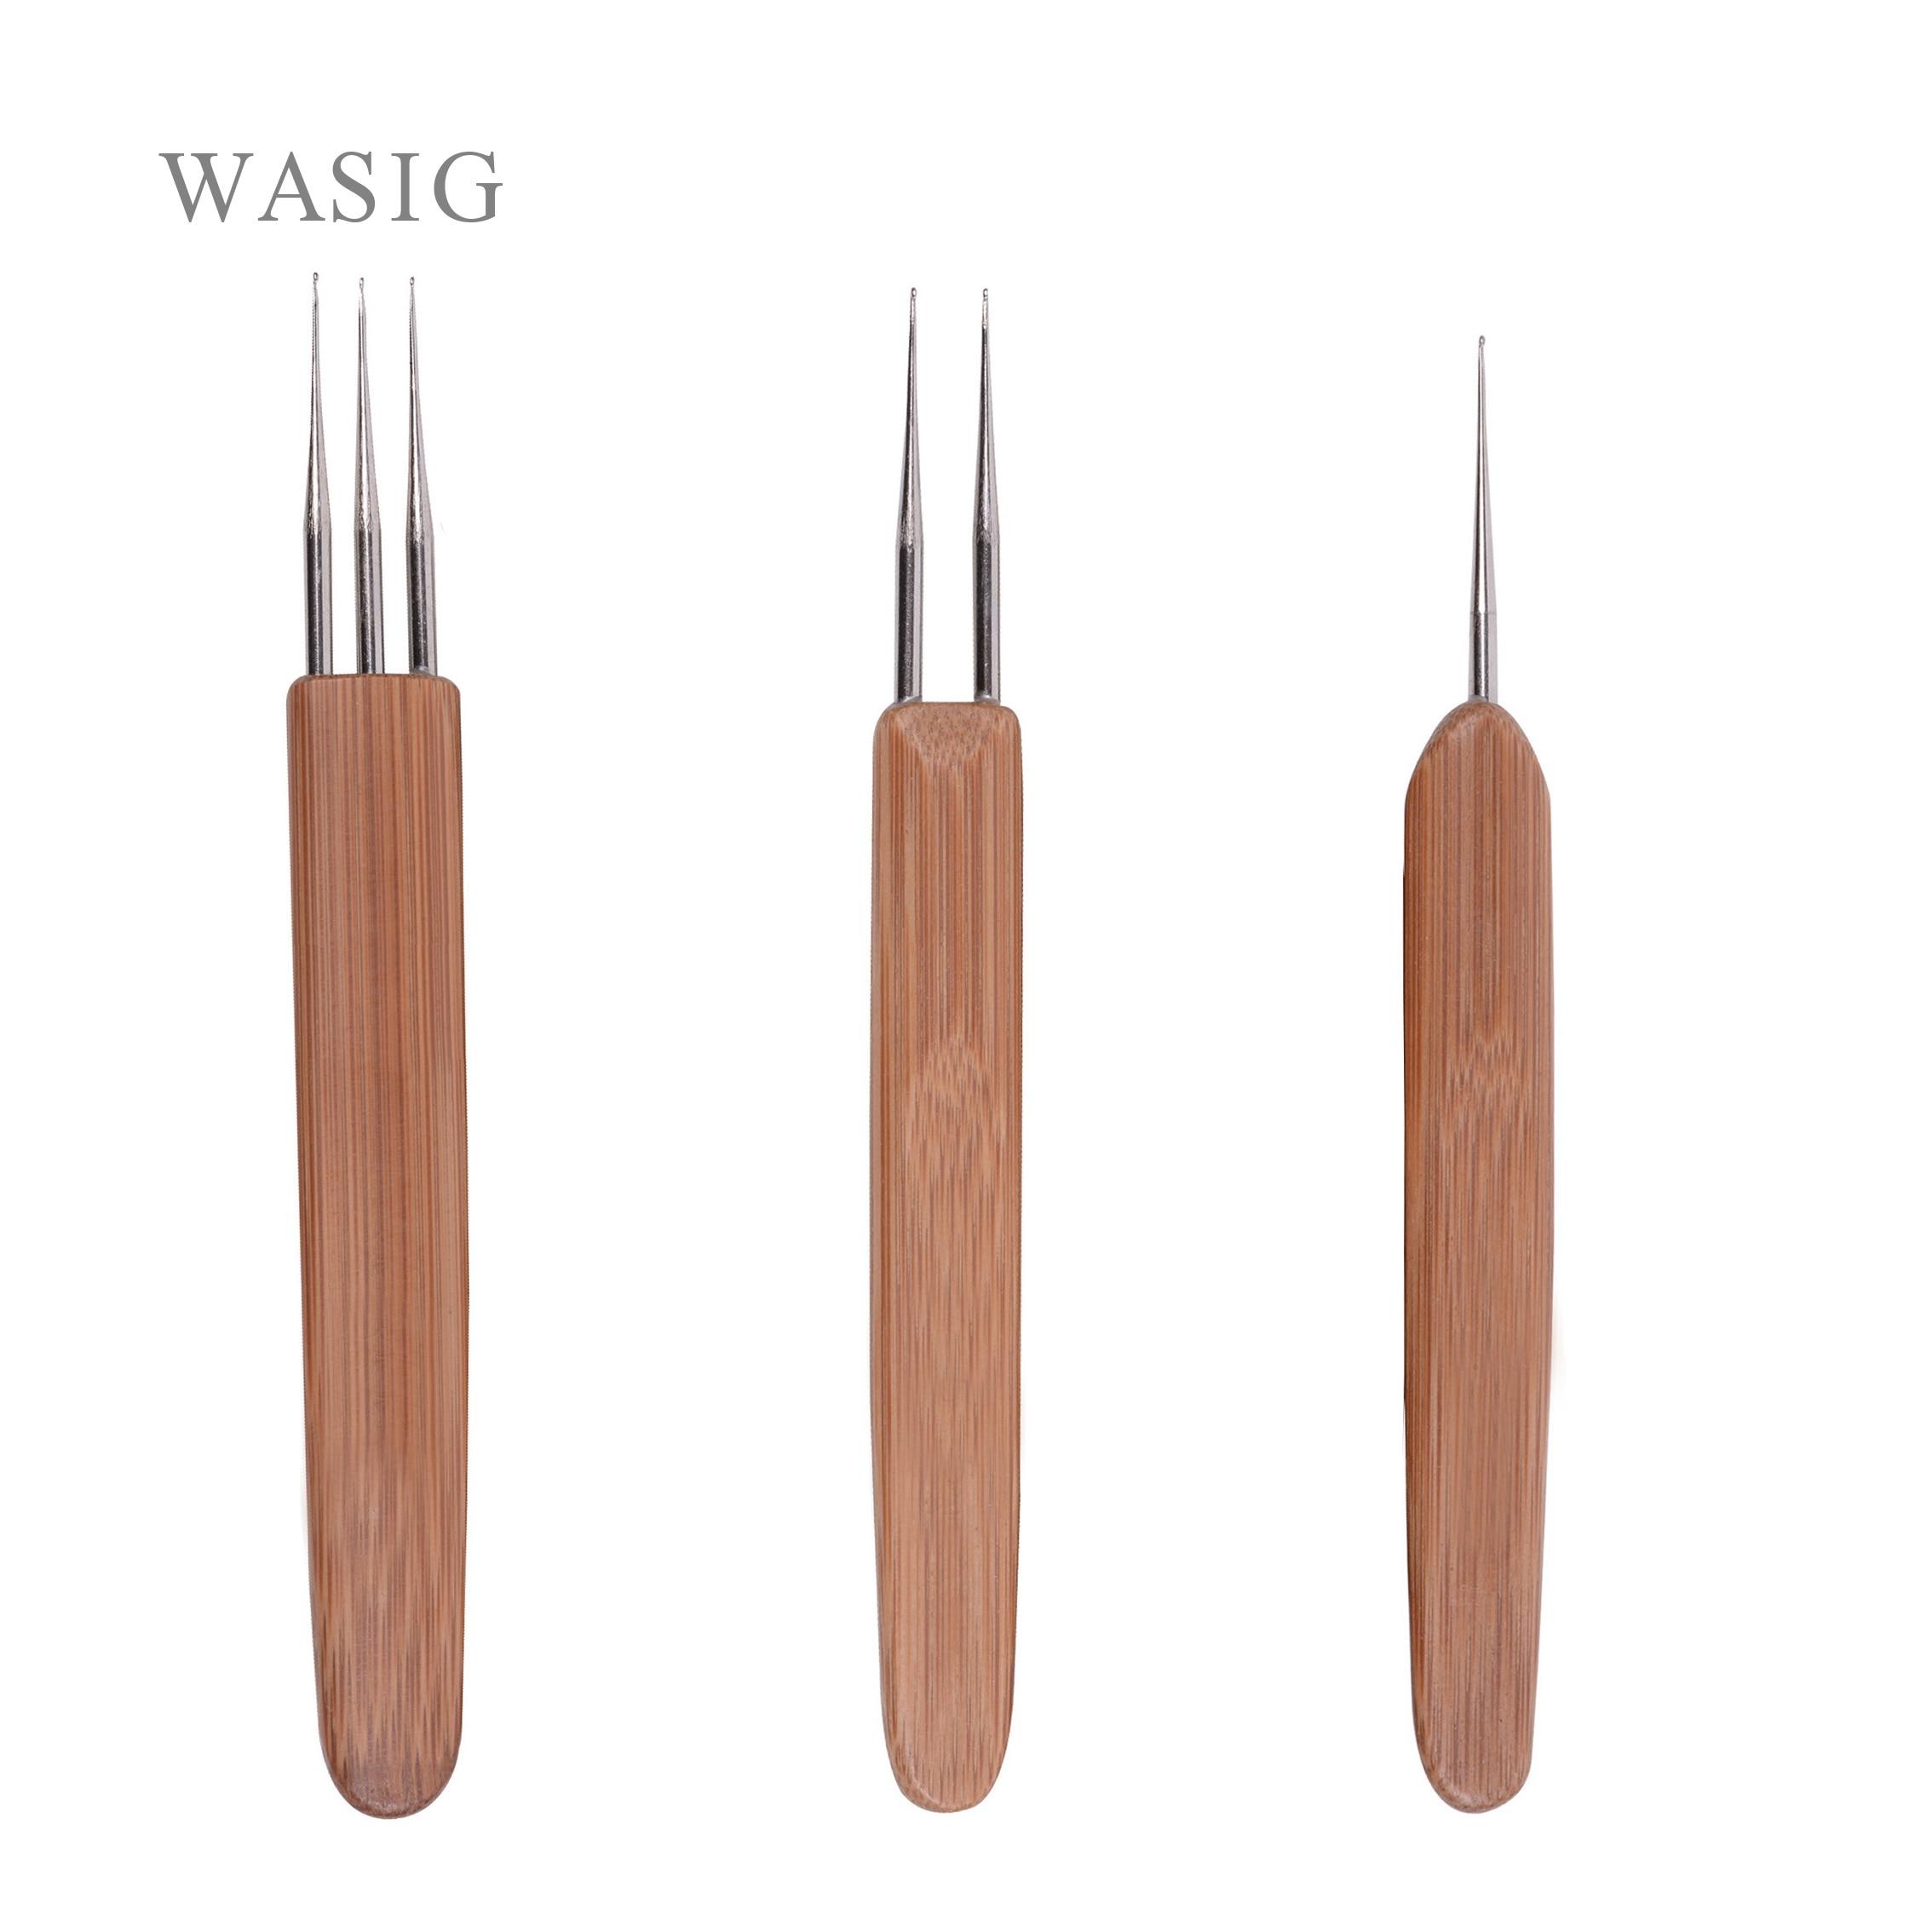 Bamboo Crochet Needle For Hair Dreadlock Accessories Wig Making Tools Dreadlocks Hook Needles 1/2/3 Hooks